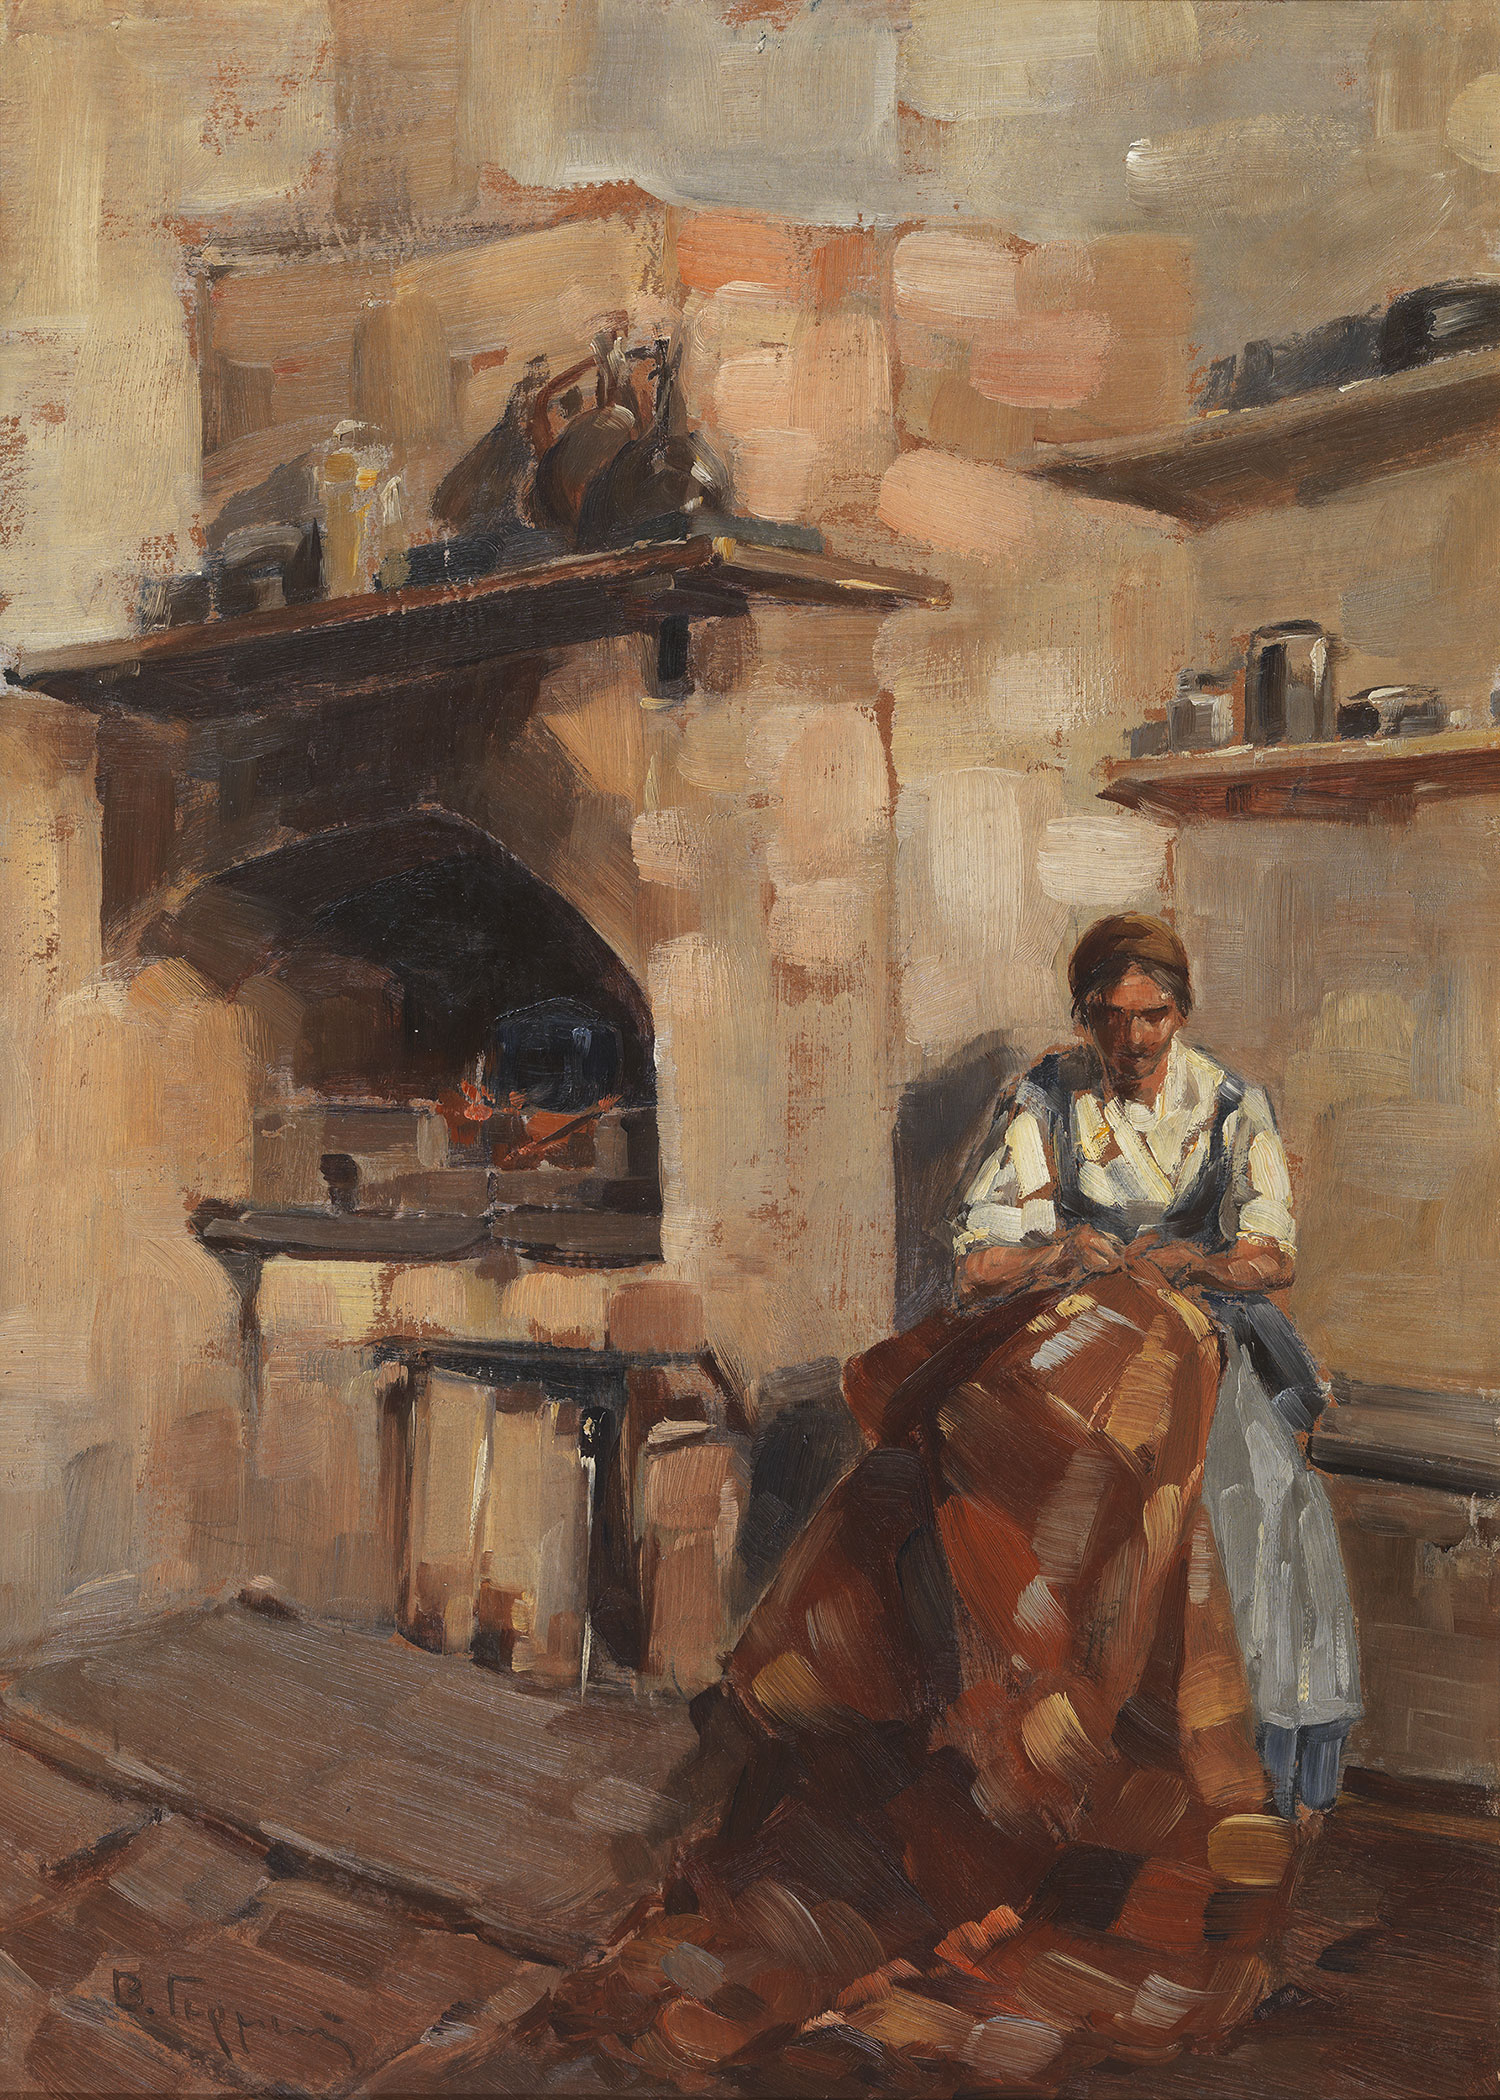 Vassilios Germenis | Mending the blanket